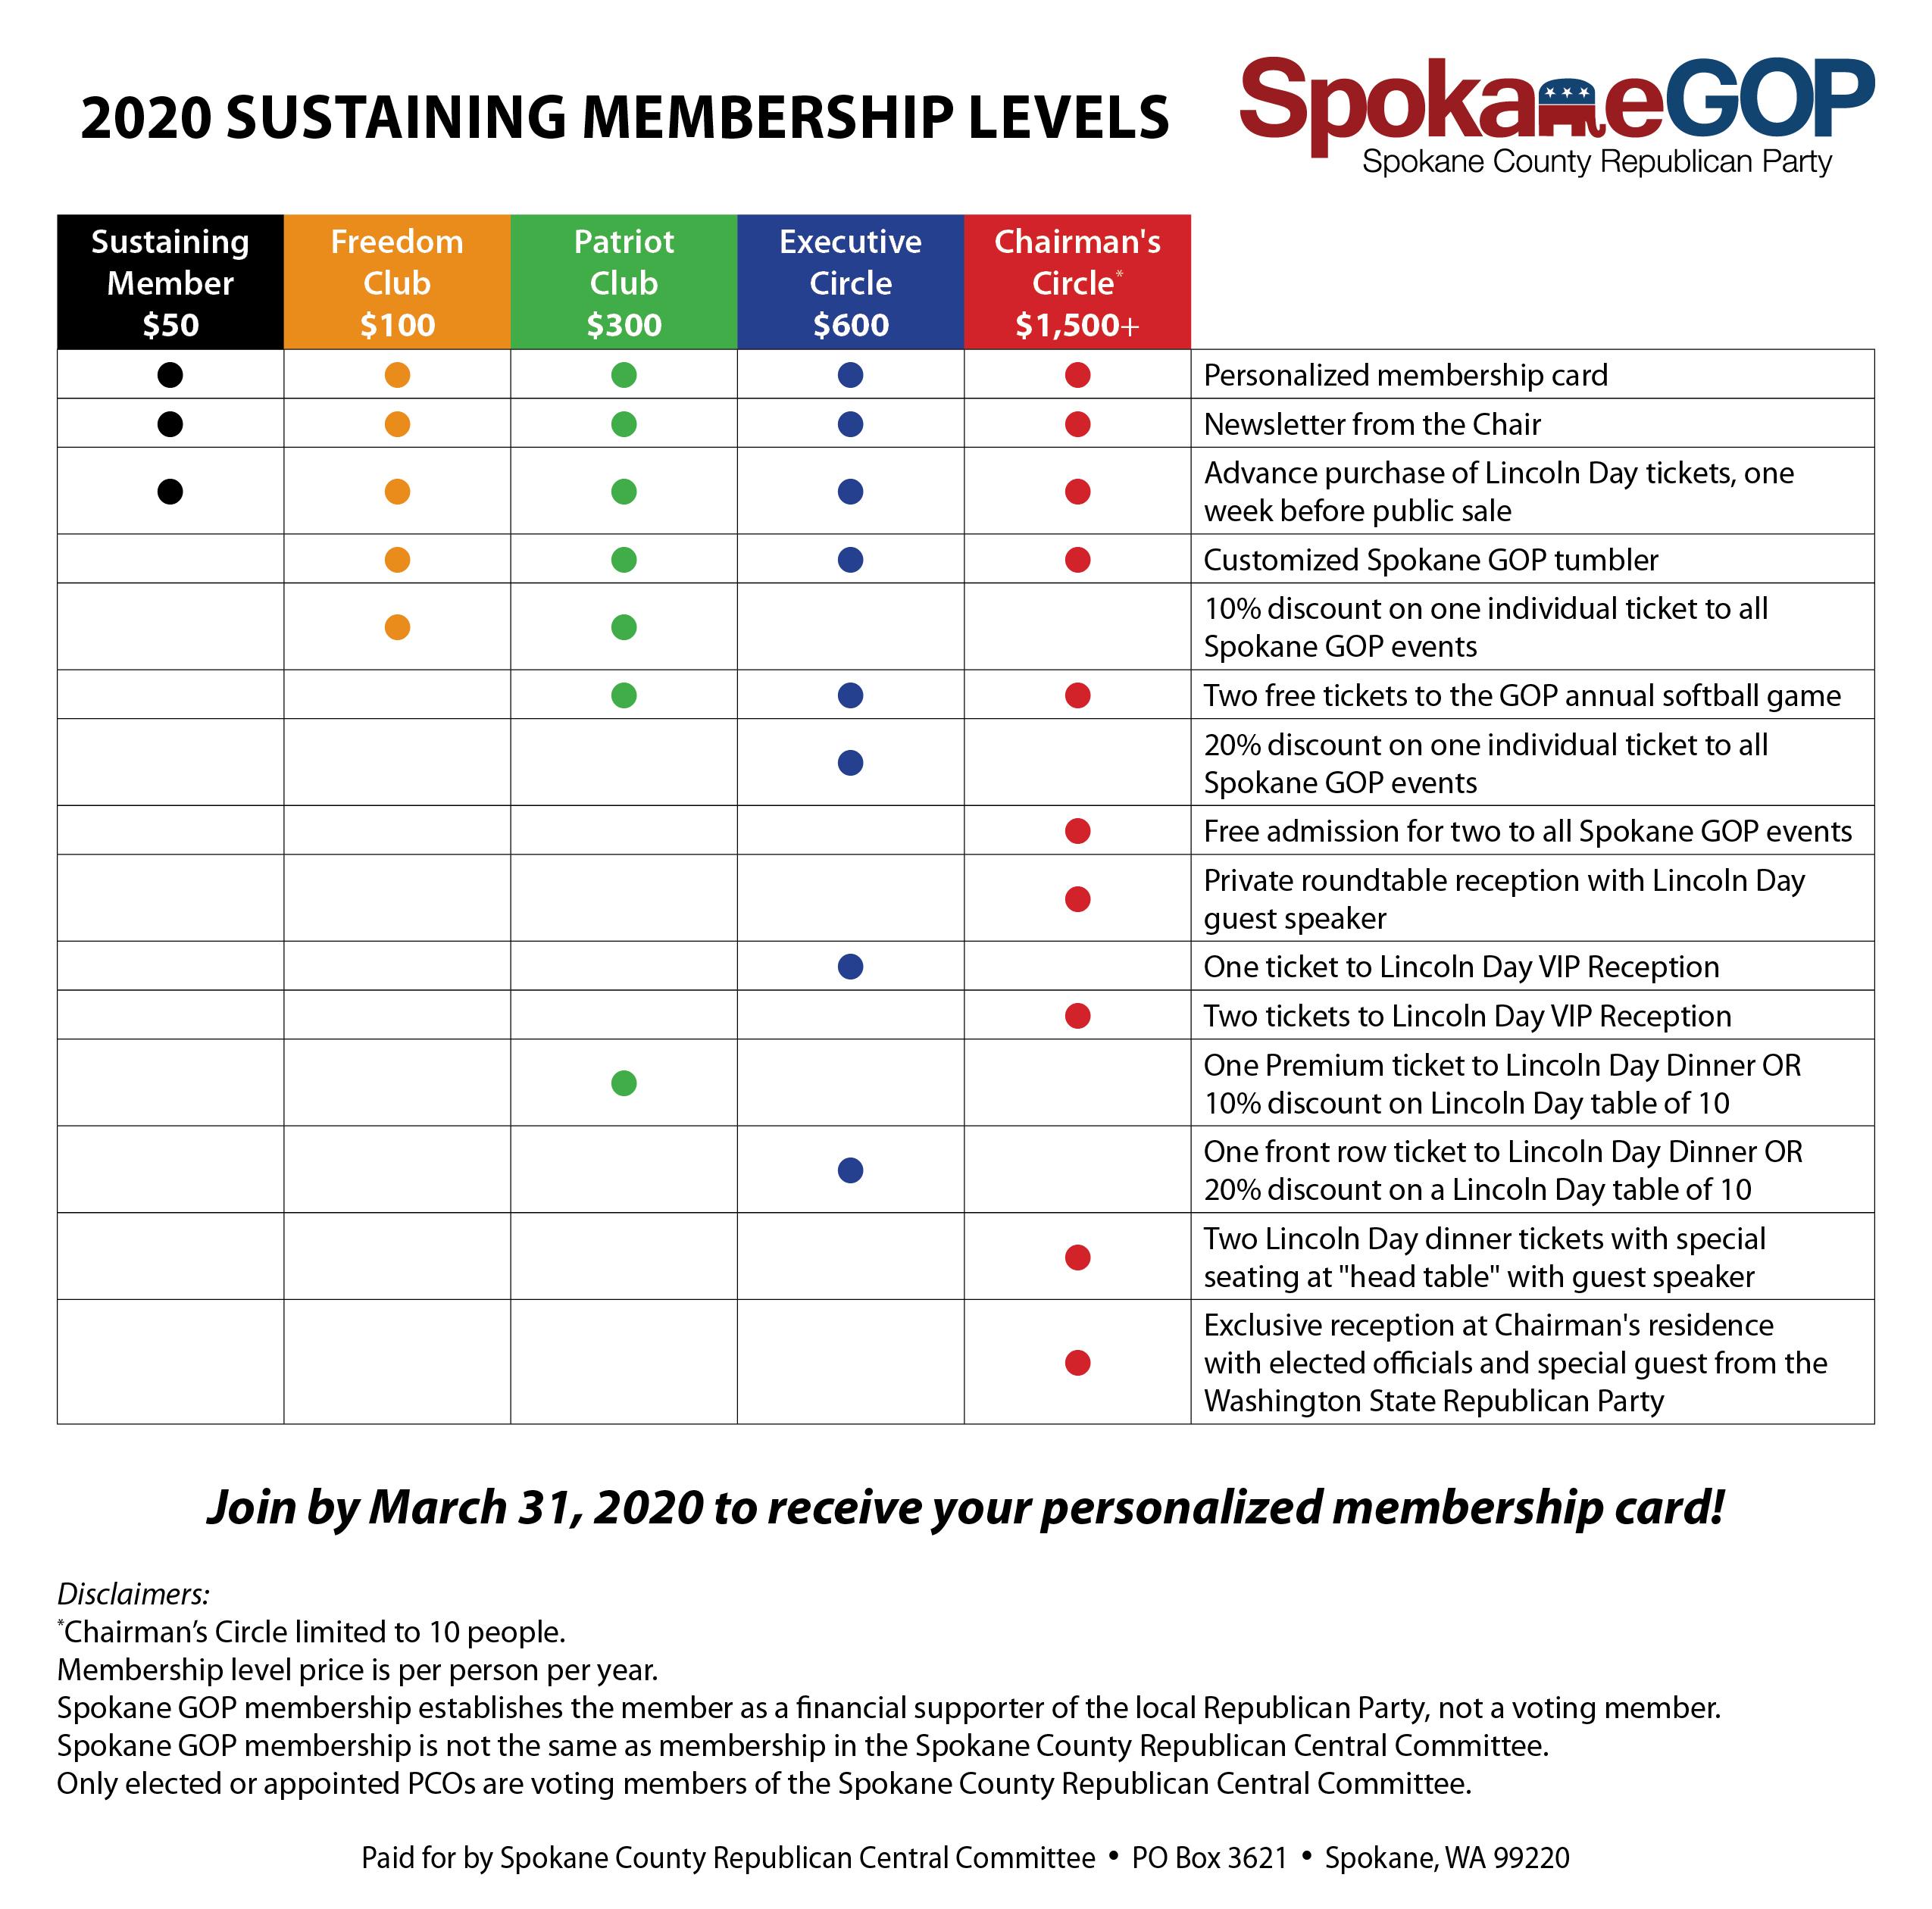 Spokane_GOP_2020_Membership_Graphic.jpg